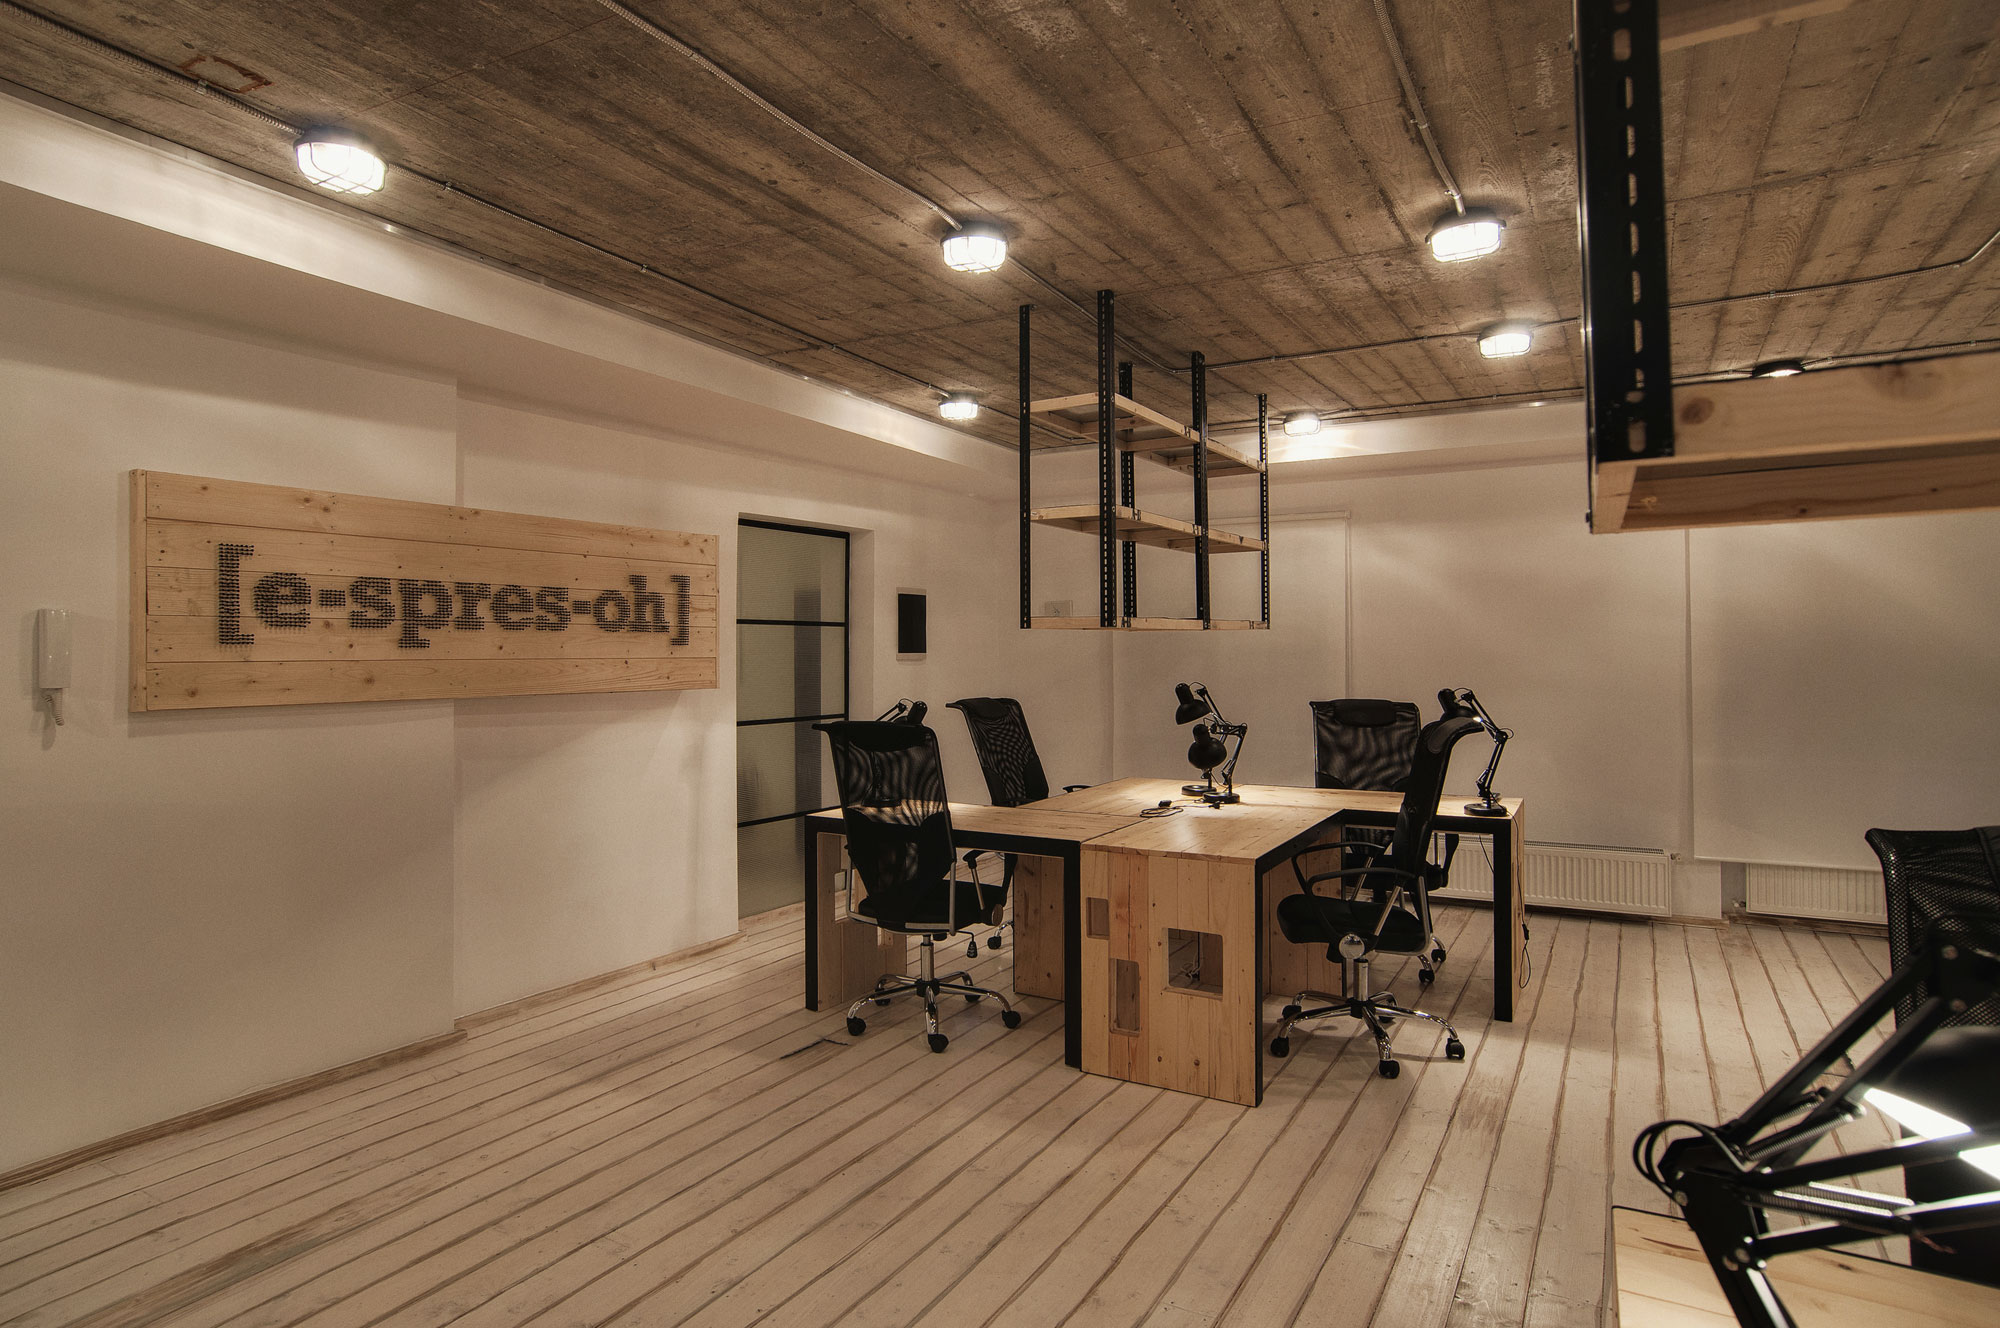 E Spres Oh Office By Ezzo Design Caandesign